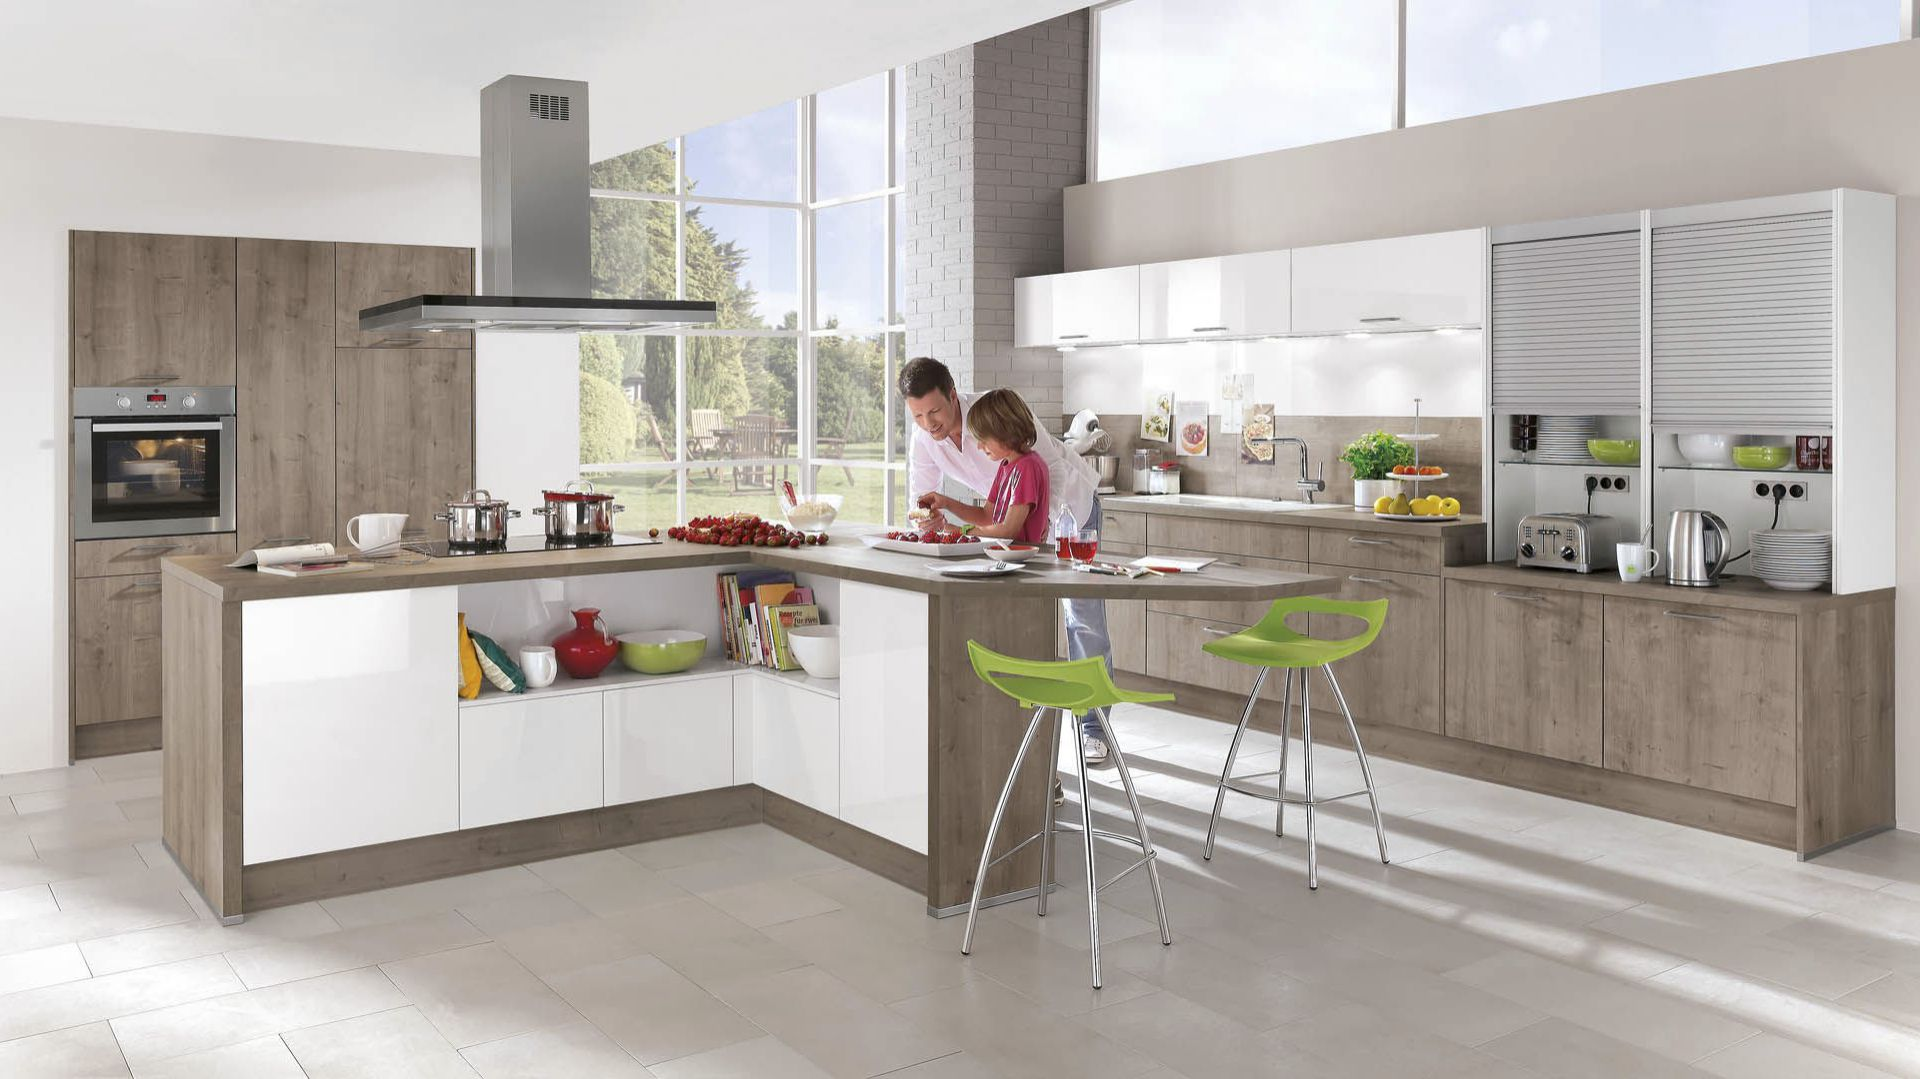 Kontrasty W Kuchni 10 Pomyslow Na Modne Meble